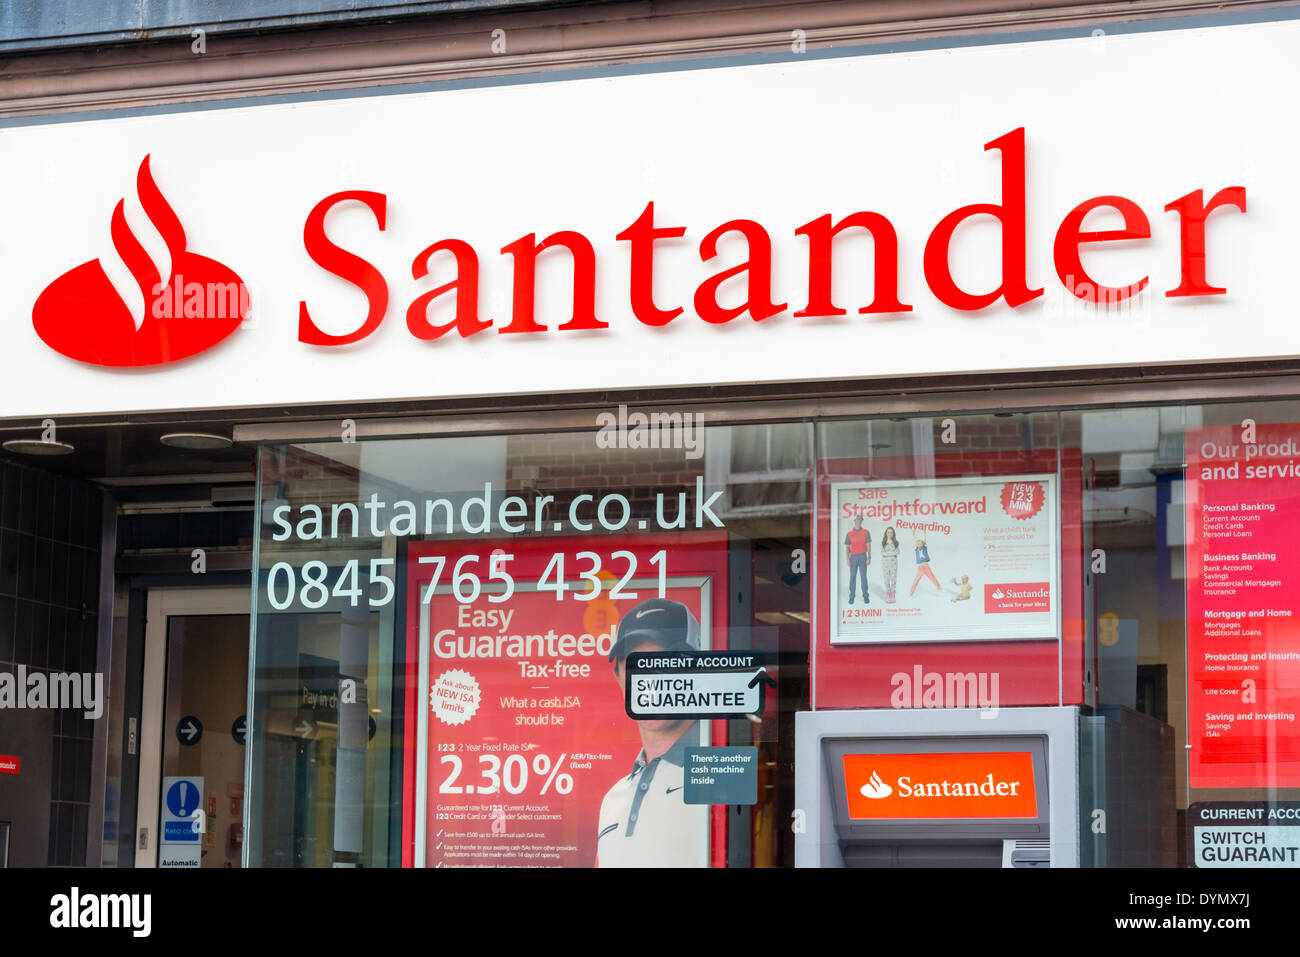 La Banque Santander, au Royaume-Uni. Photo Stock